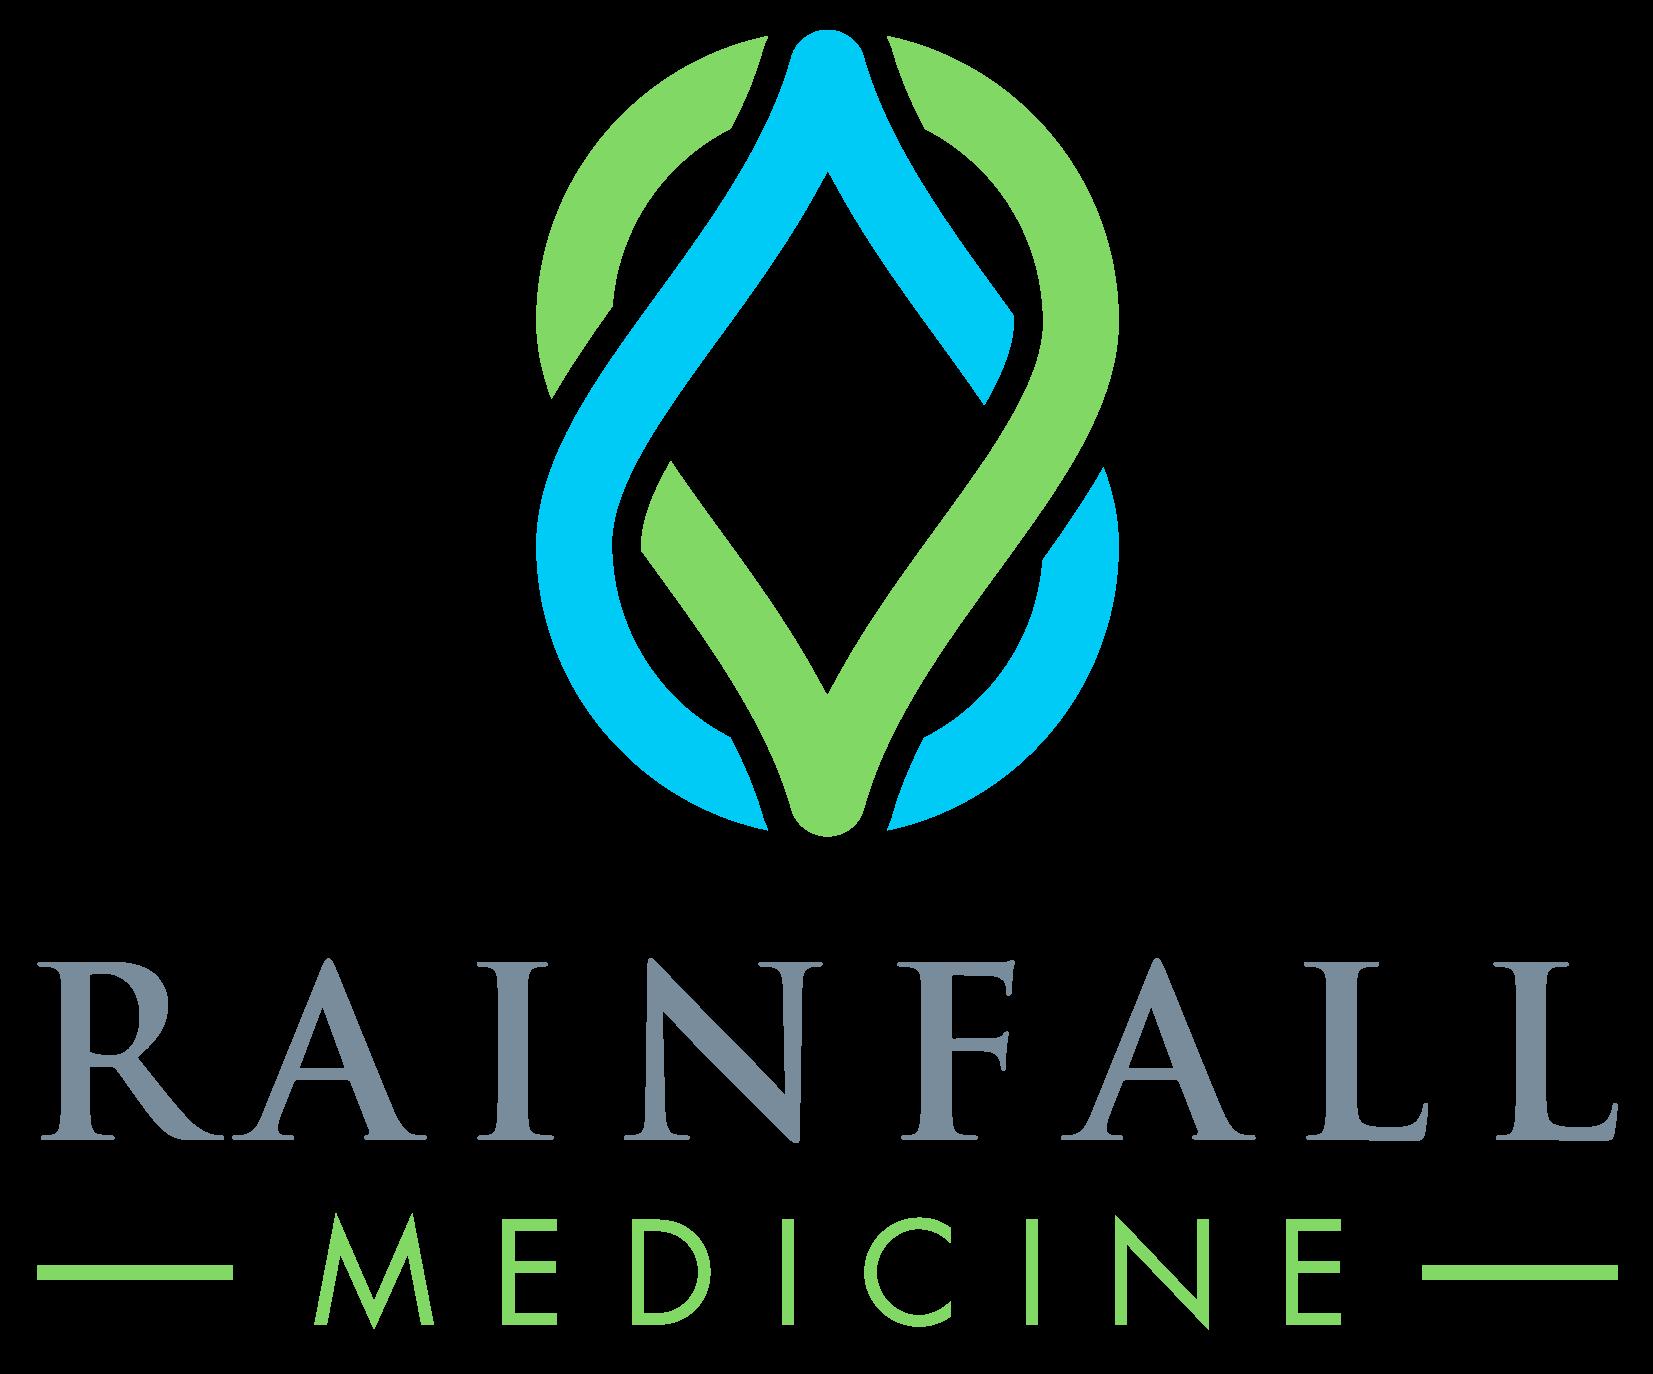 Rainfall Medicine